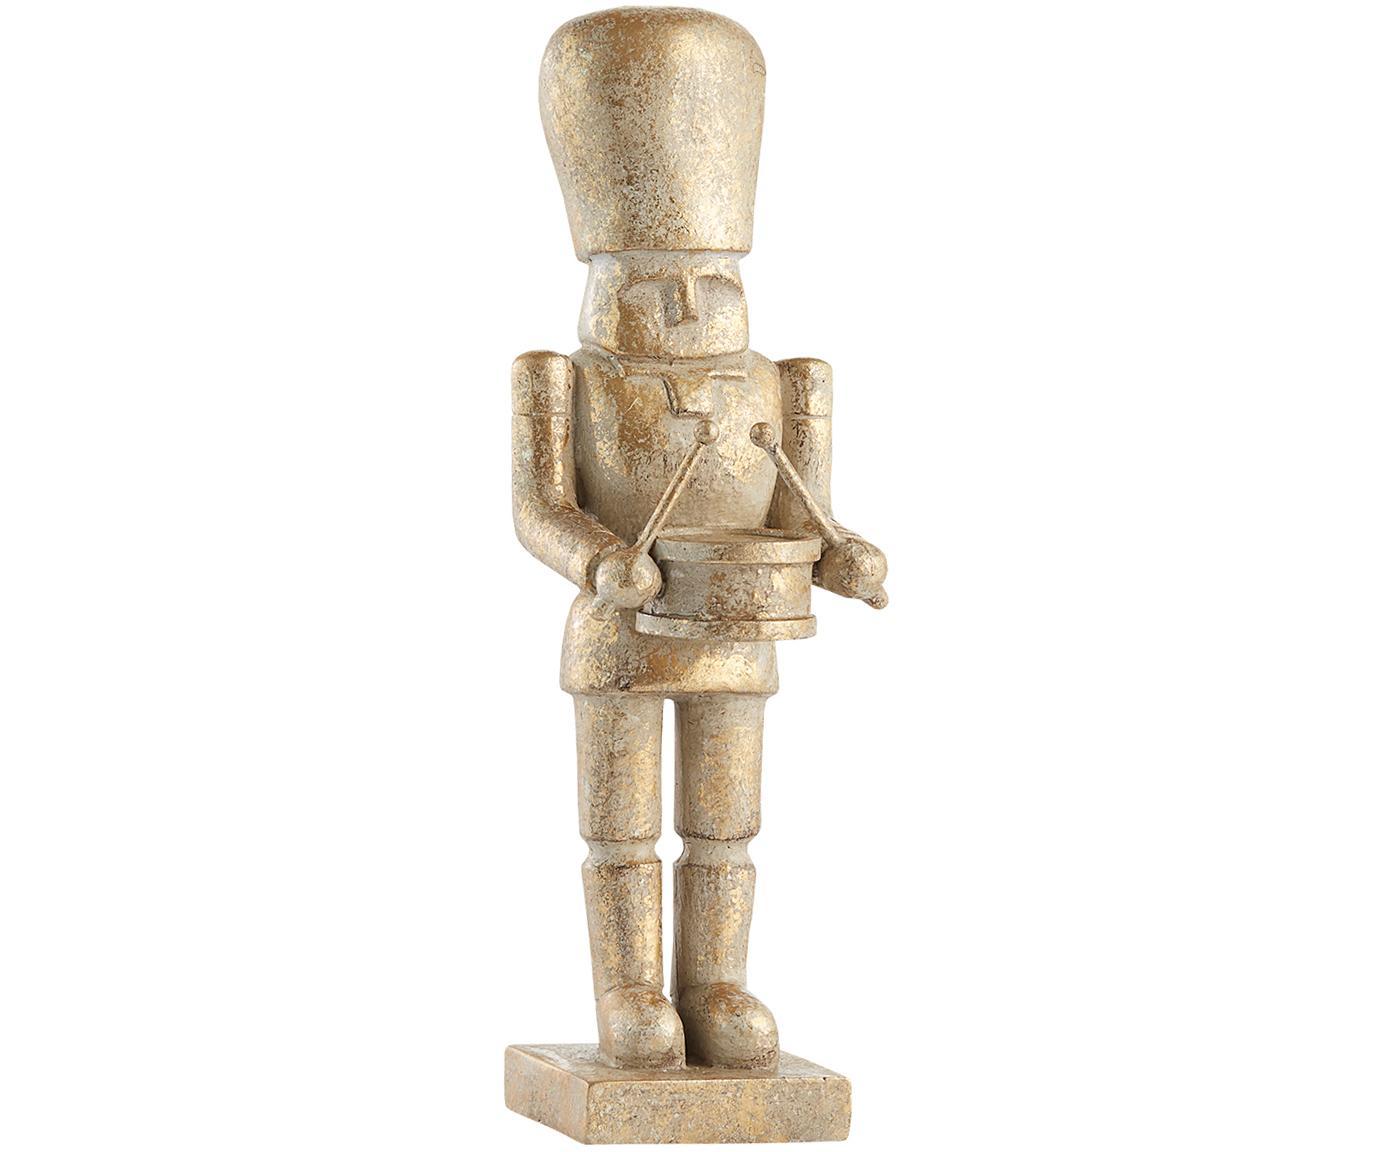 Figura decorativa Drummer, Poliresina, Dorado, Ø 7 x Al 23 cm